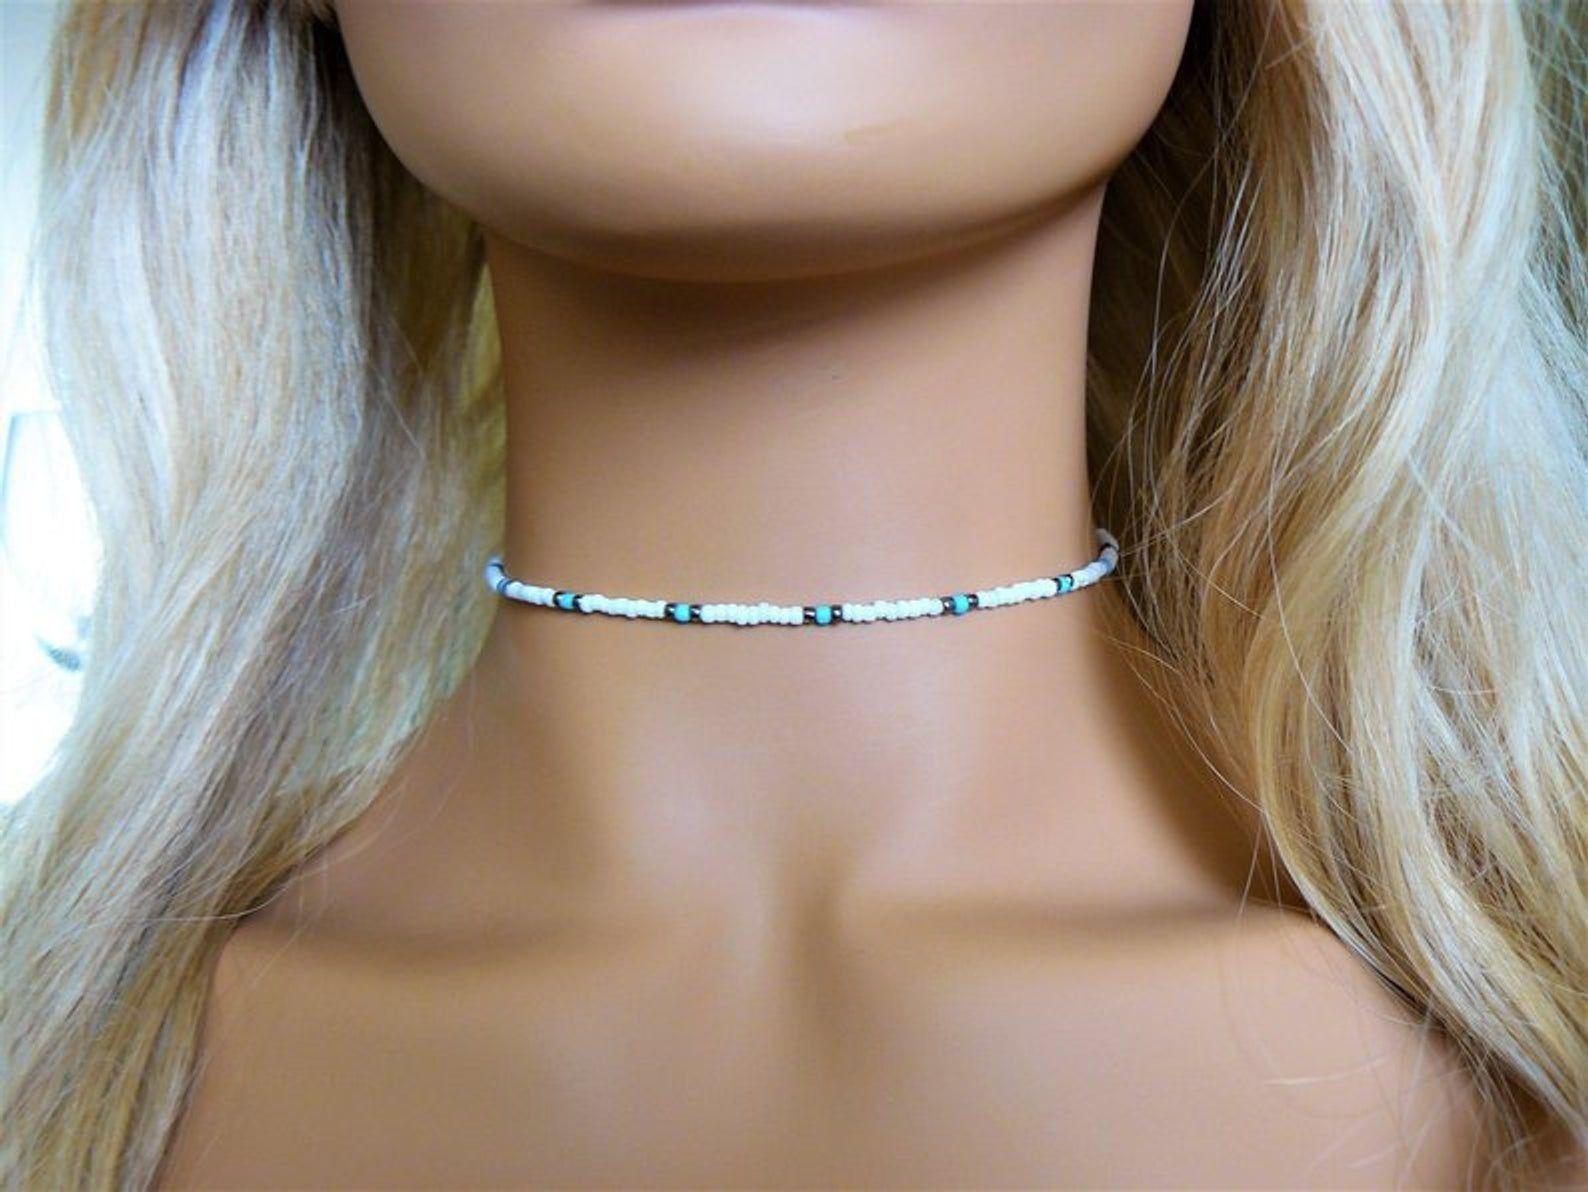 Glass Necklace Beaded Choker White Choker Beaded Necklace Glass Necklace you choose color